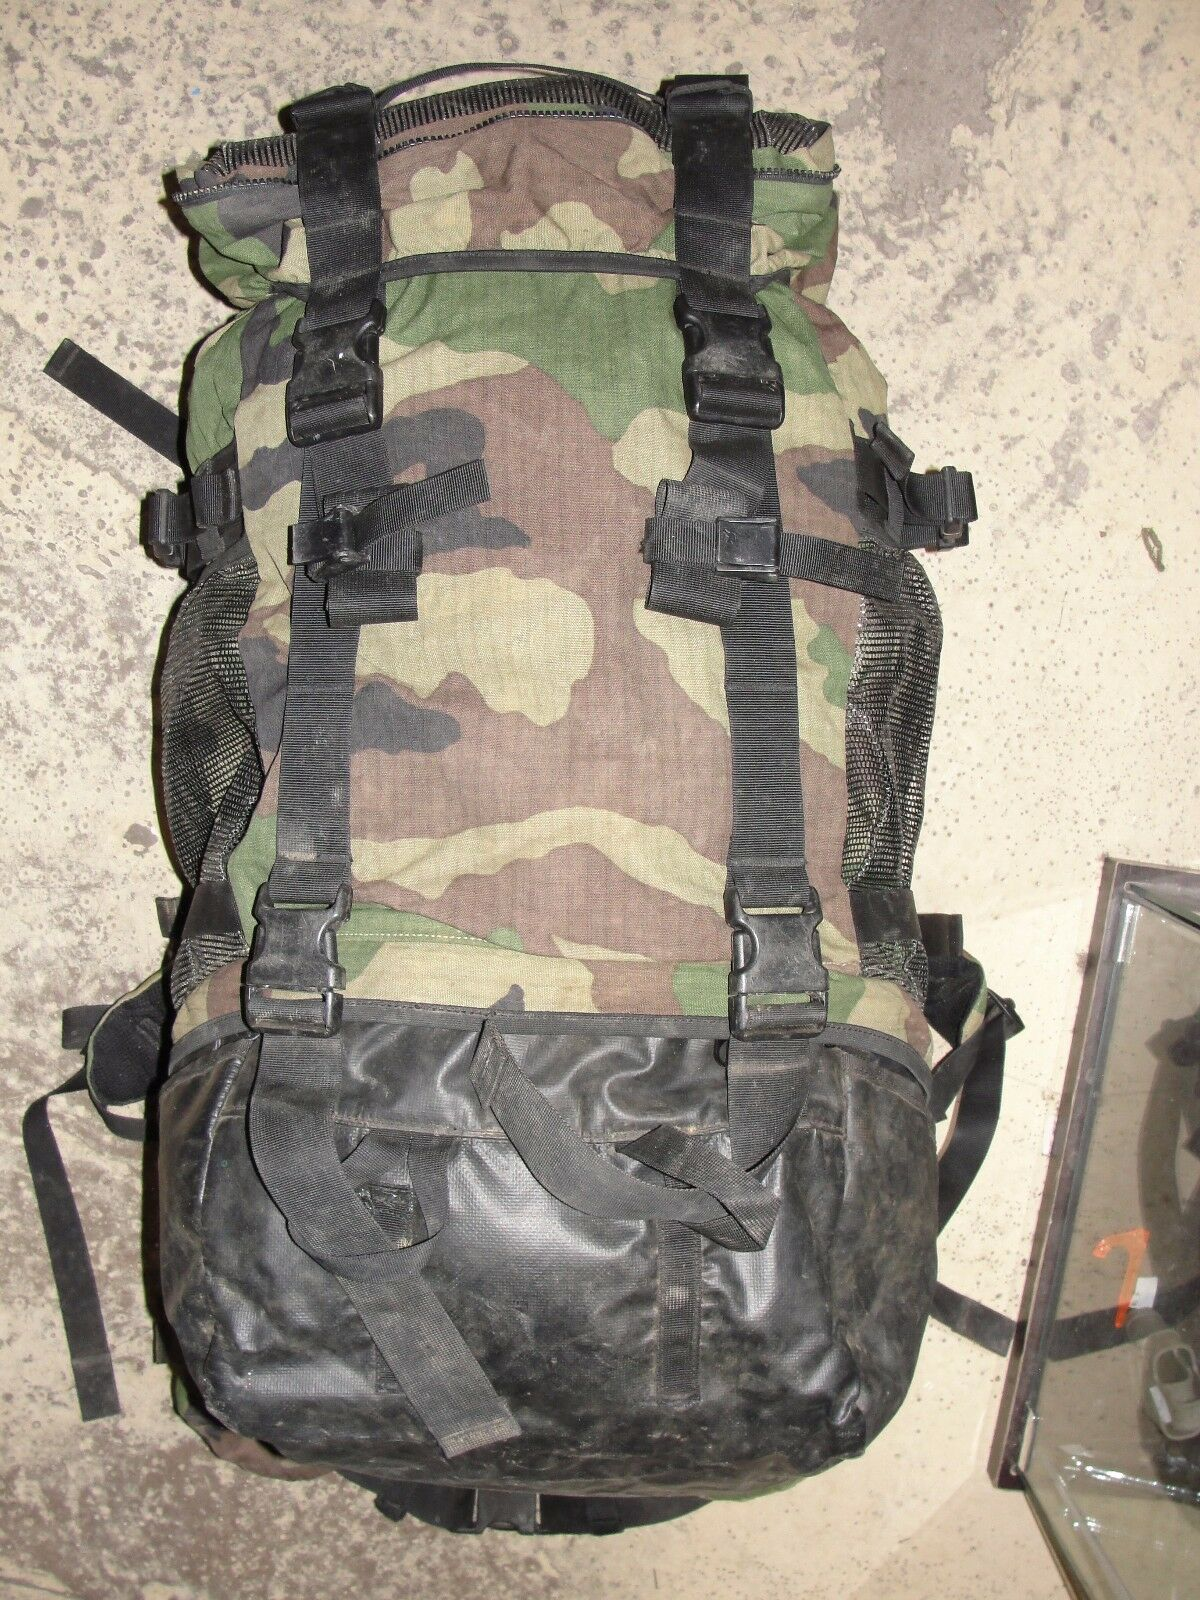 Sac  à dos Chasseur Alpin camouflage C E camo centre Europe Armée Française cam  Envío rápido y el mejor servicio